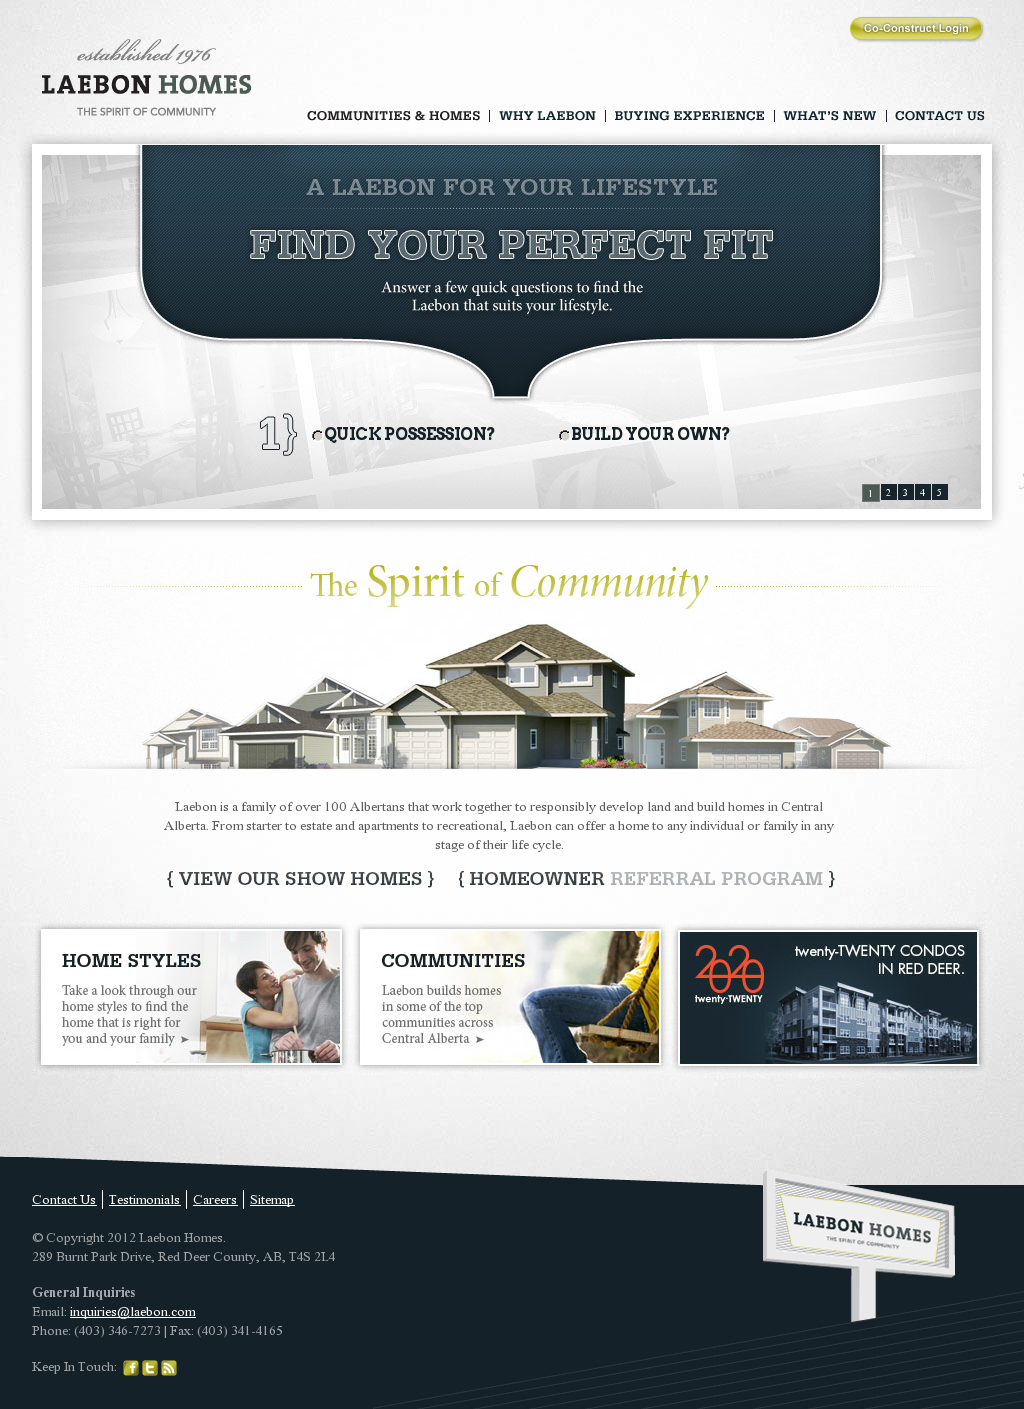 Home Builders In Red Deer Alberta Small Business Web Design Website Design Web Design